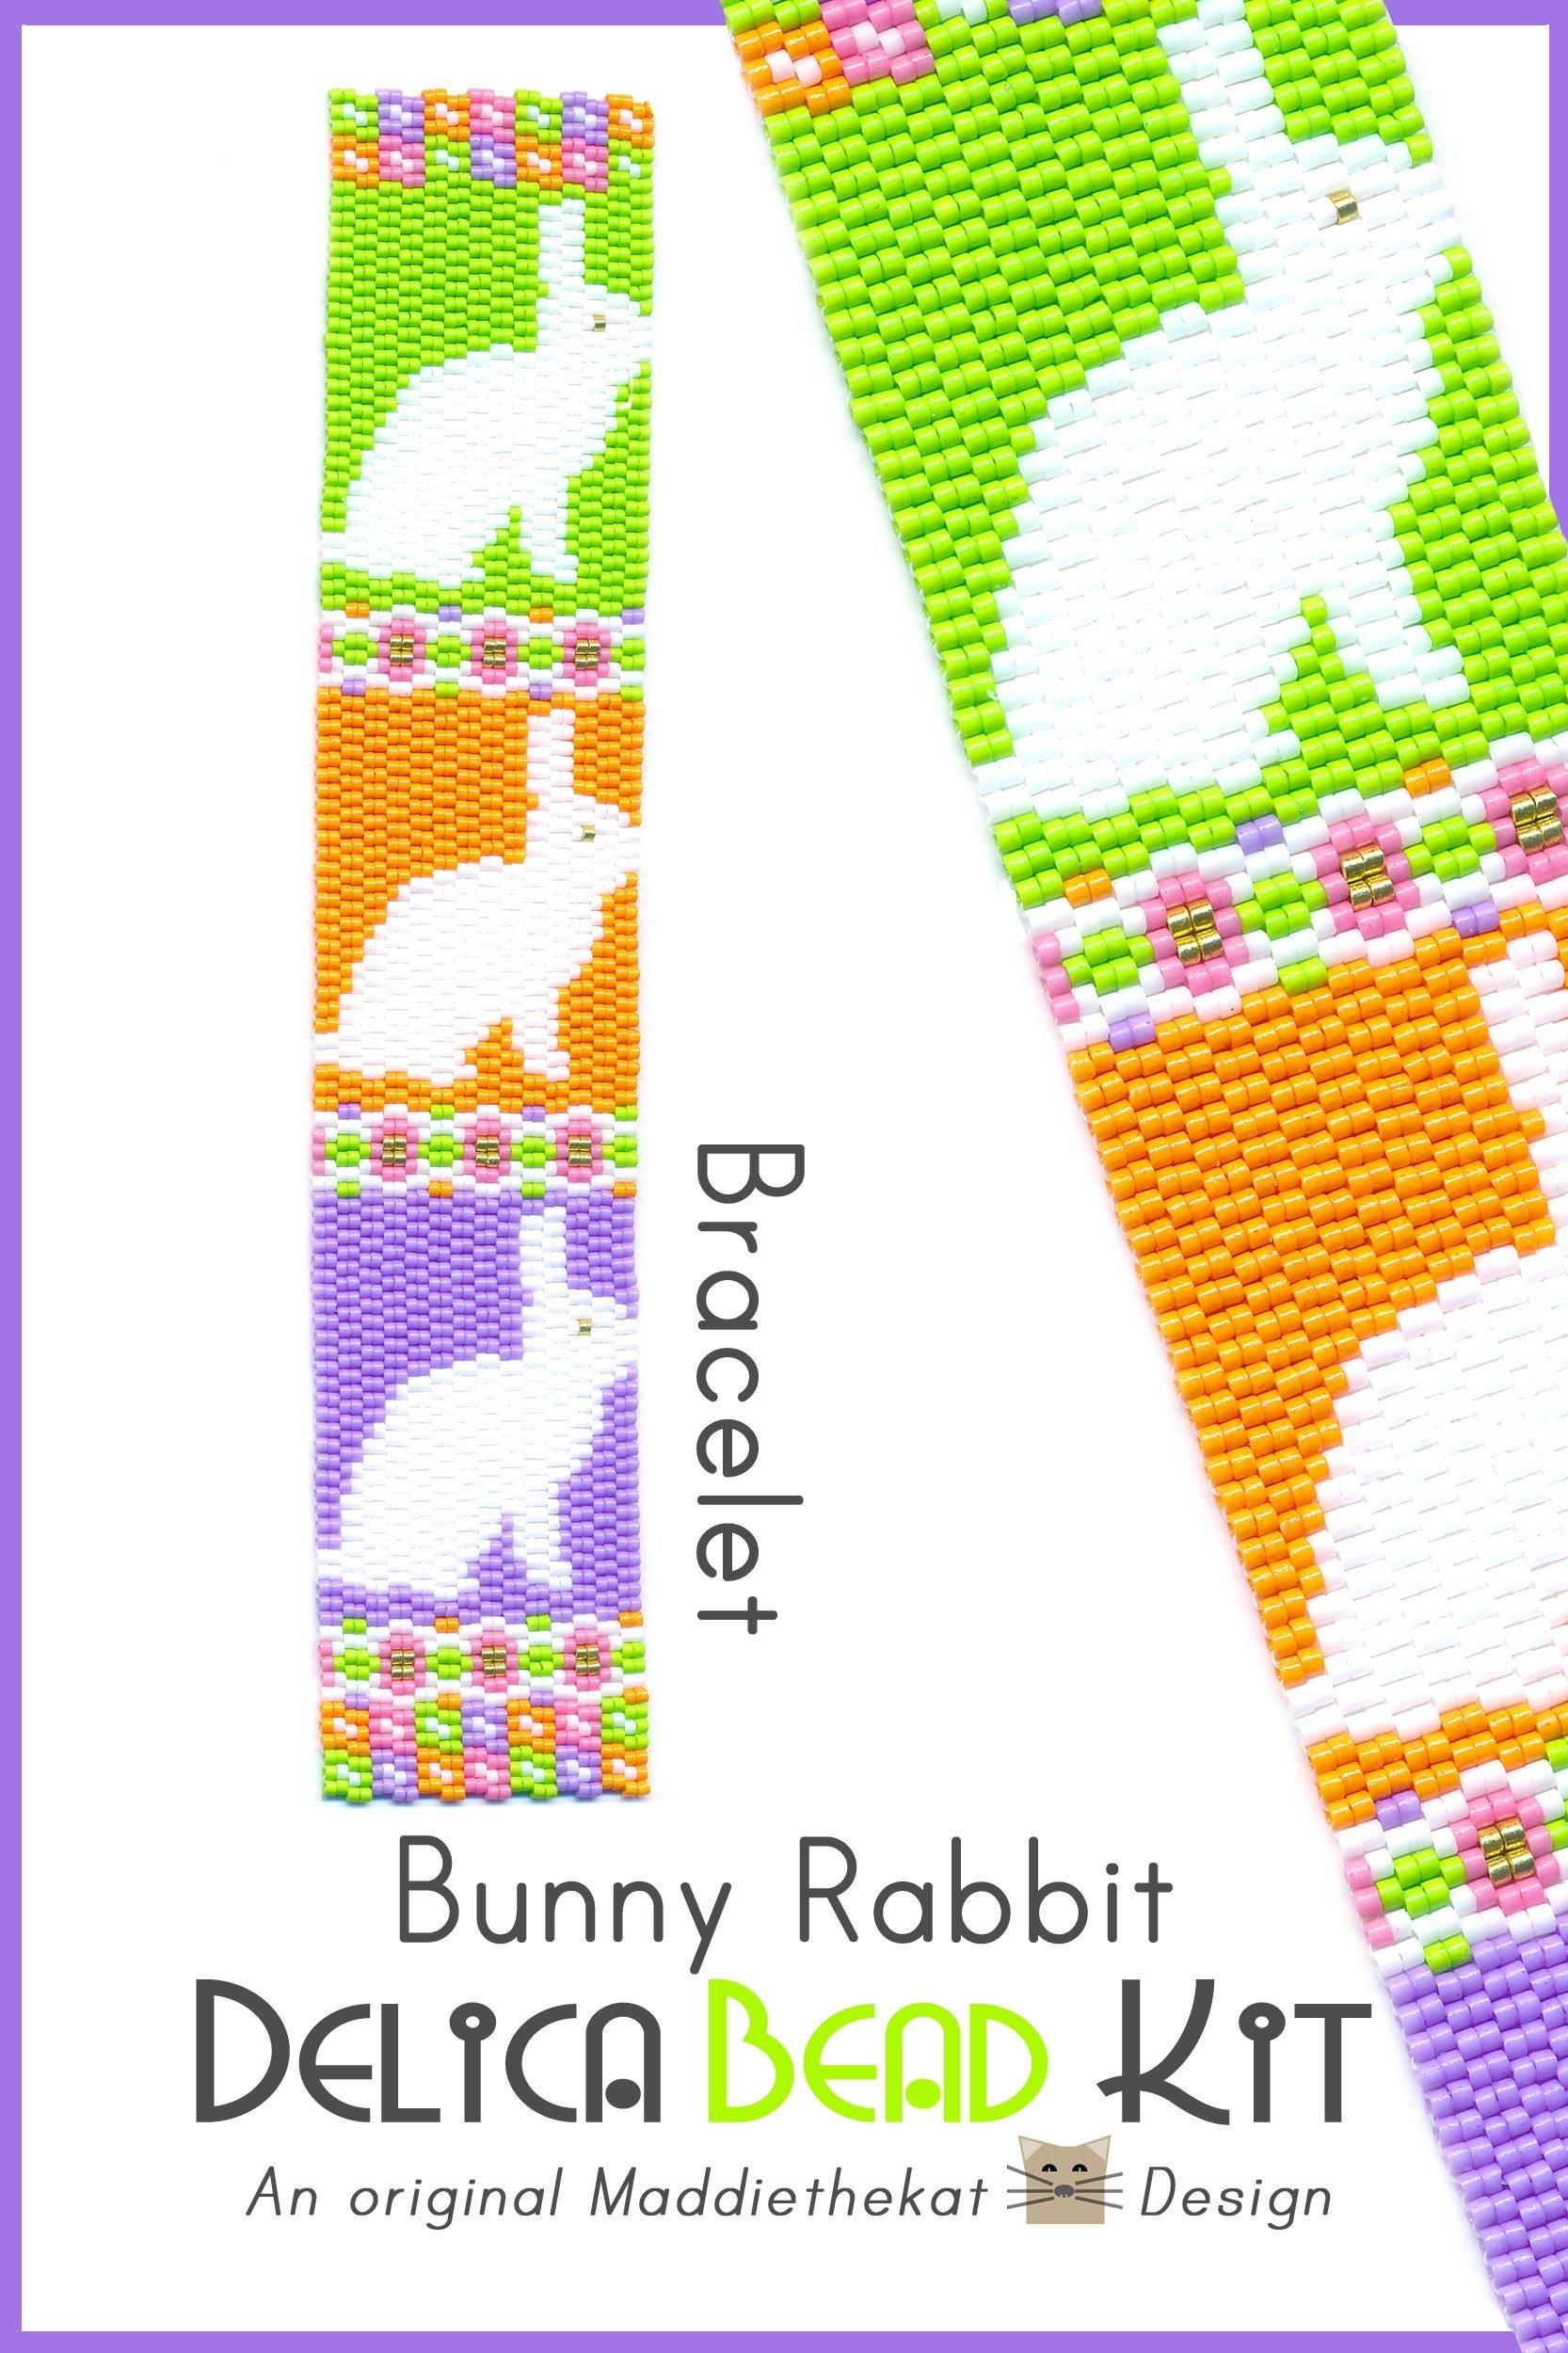 Bunny Rabbit Bracelet 2-Drop Peyote Seed Bead Pattern Delica DIY KIT-Maddiethekat Designs